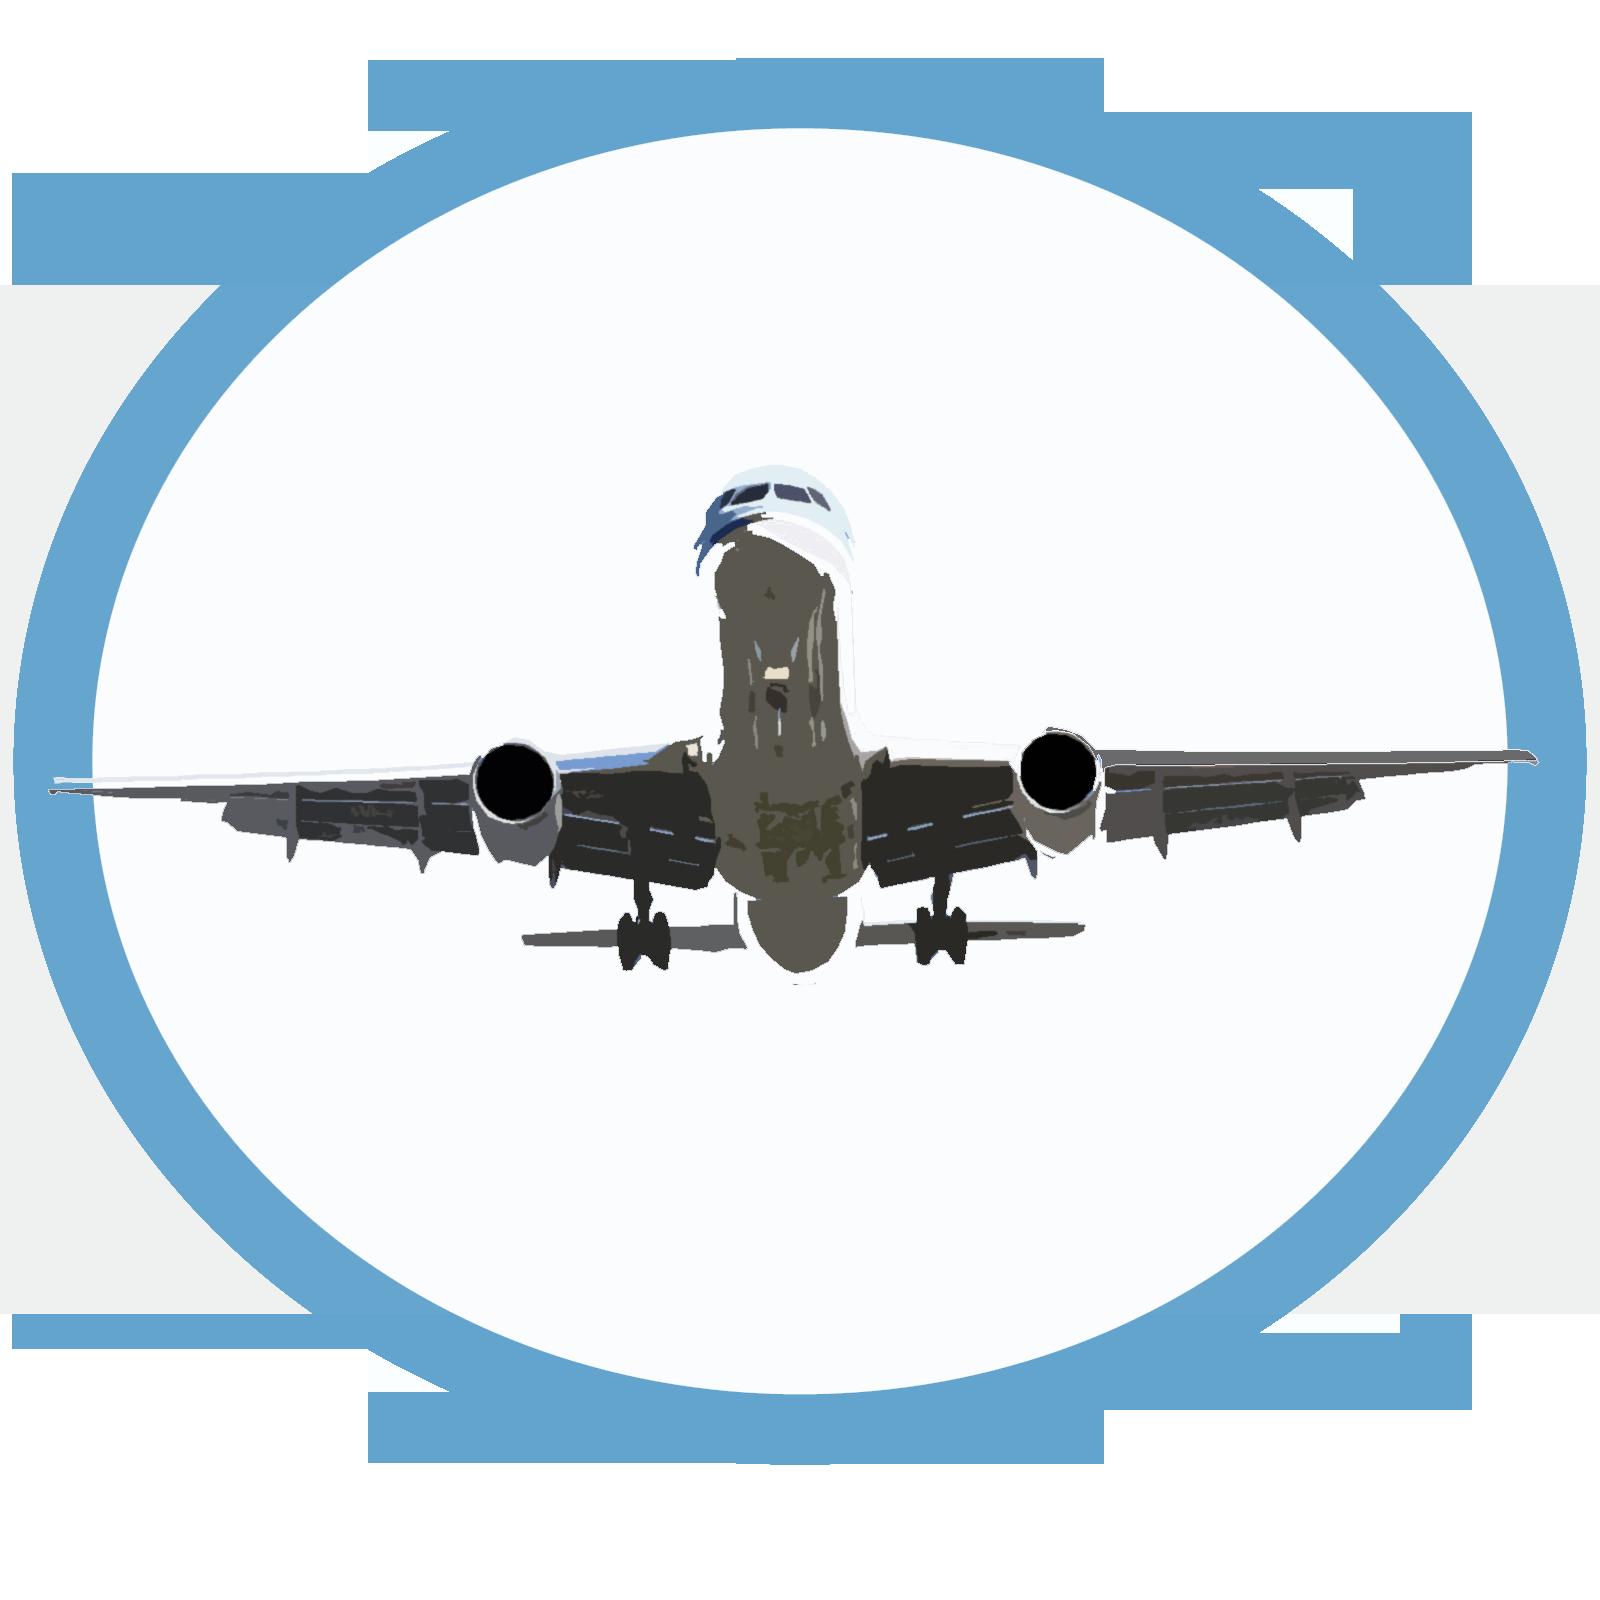 Airliners.net Quiz